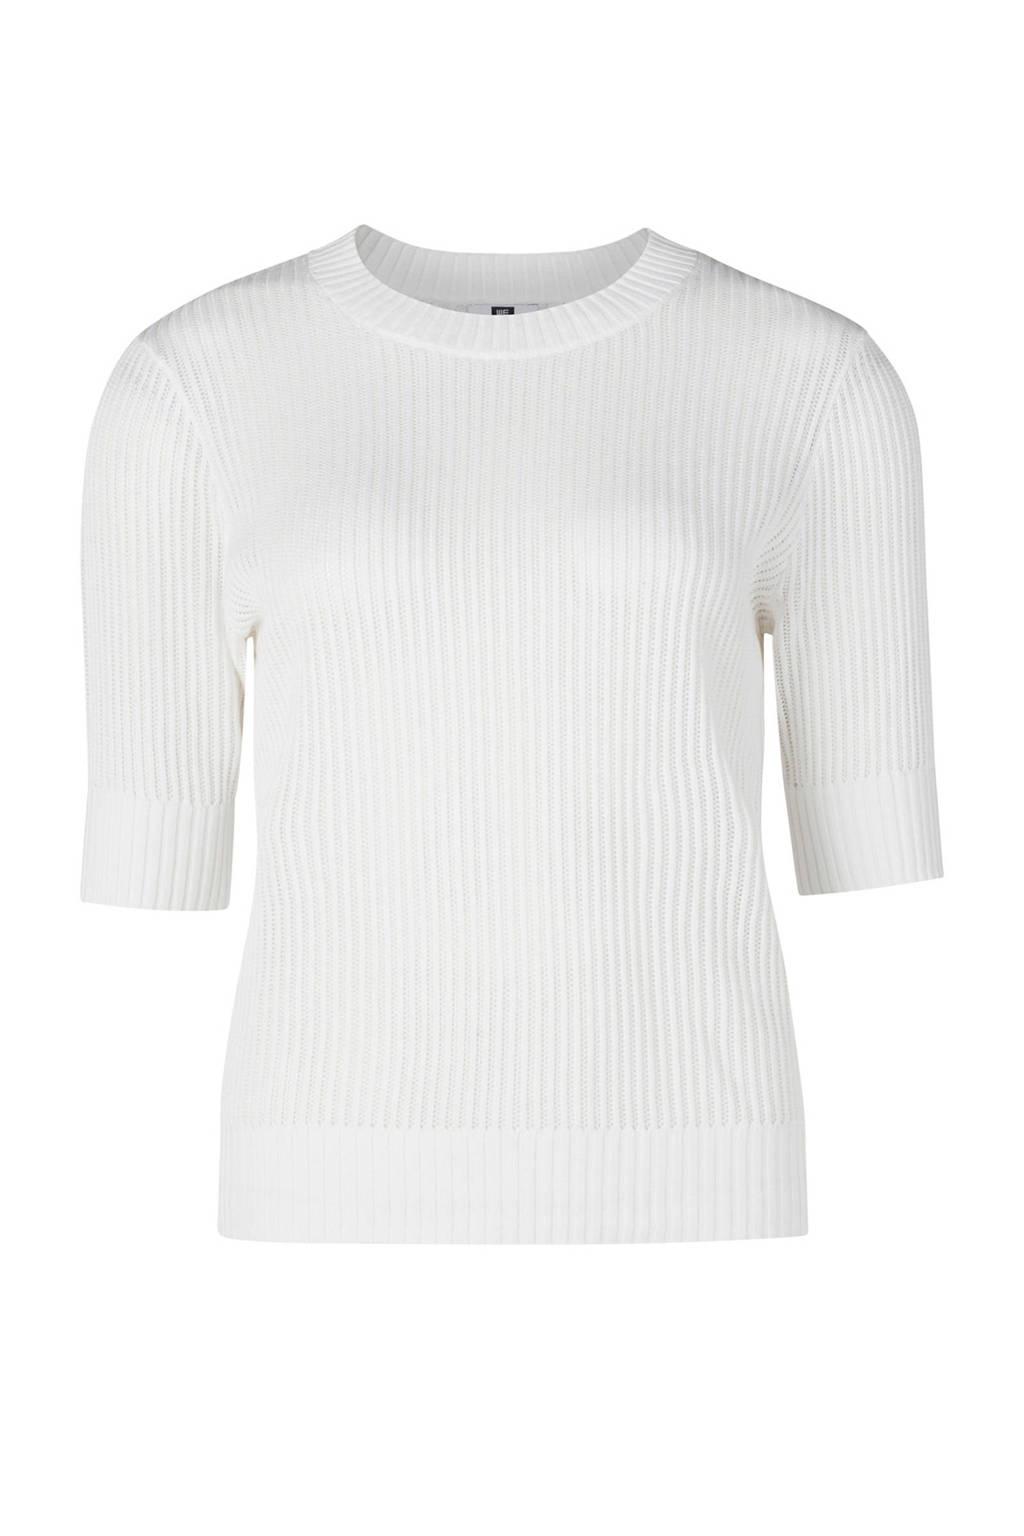 WE Fashion trui gebroken wit, Gebroken wit